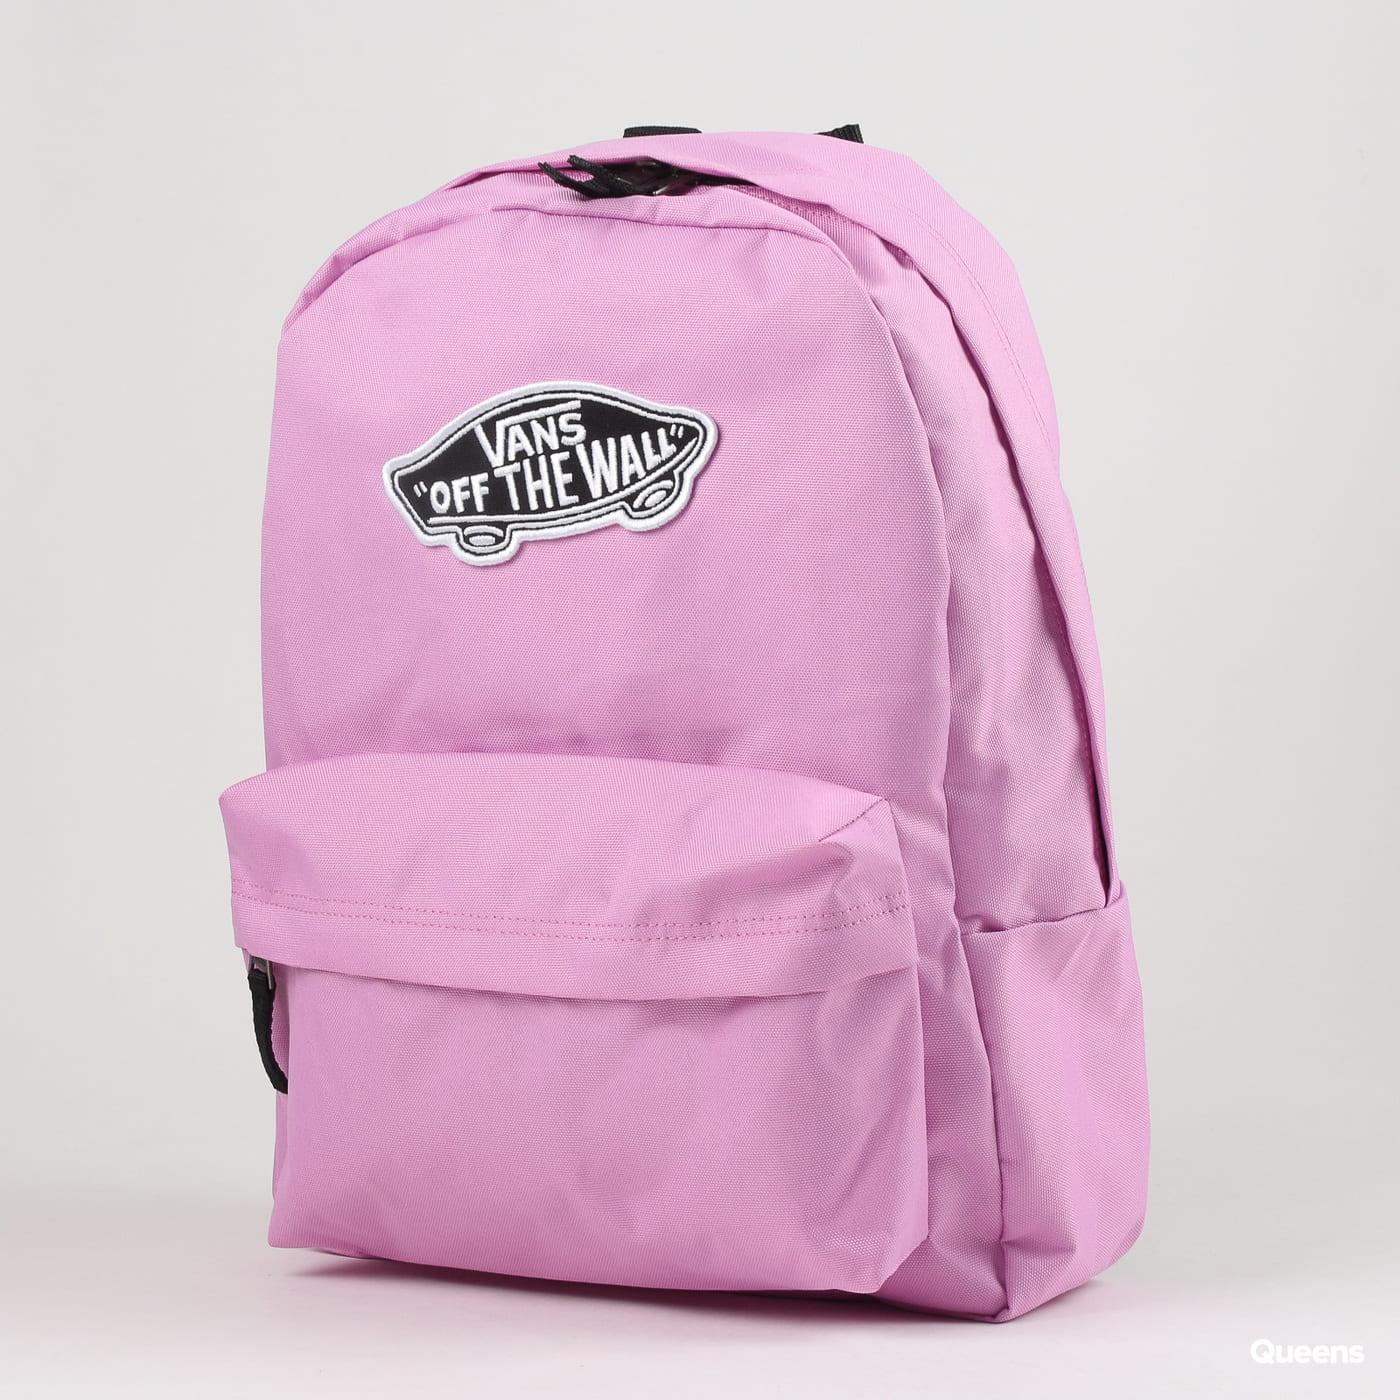 49ace77d4 Batoh Vans Realm Backpack (VN0A3UI6VLT) – Queens 💚